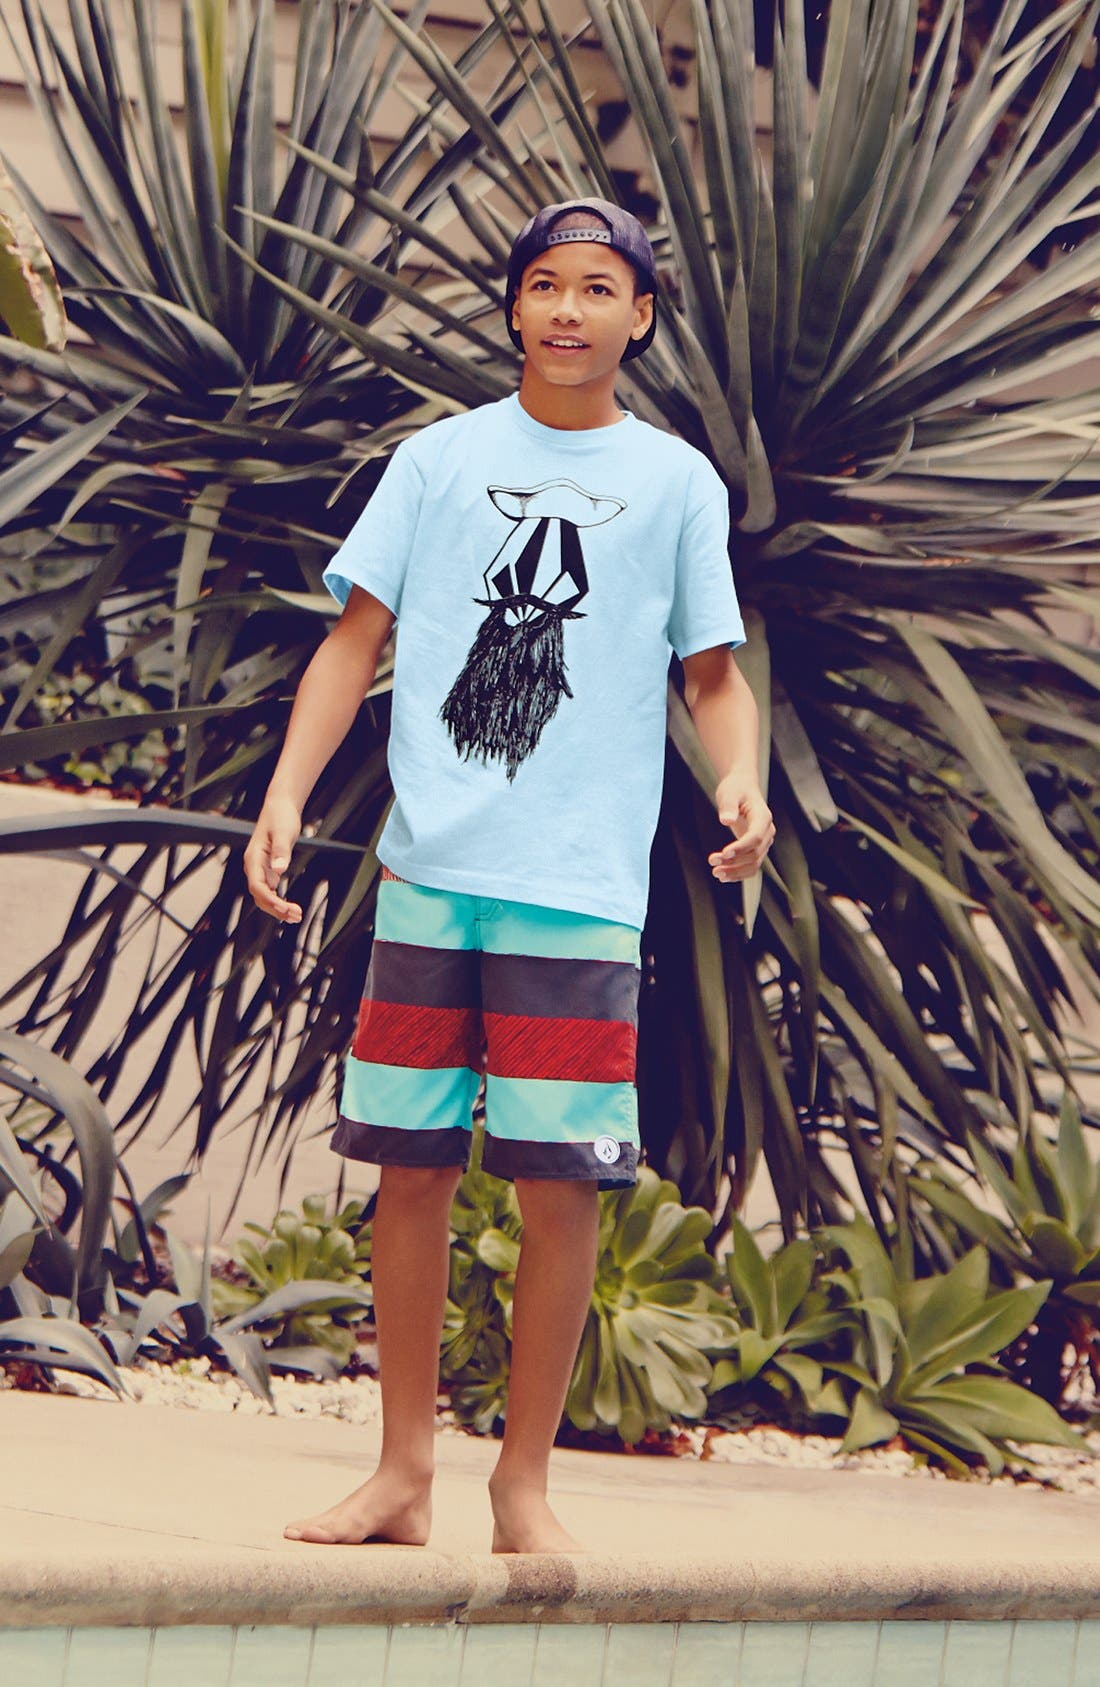 Alternate Image 1 Selected - Volcom T-Shirt & Board Shorts (Big Boys)